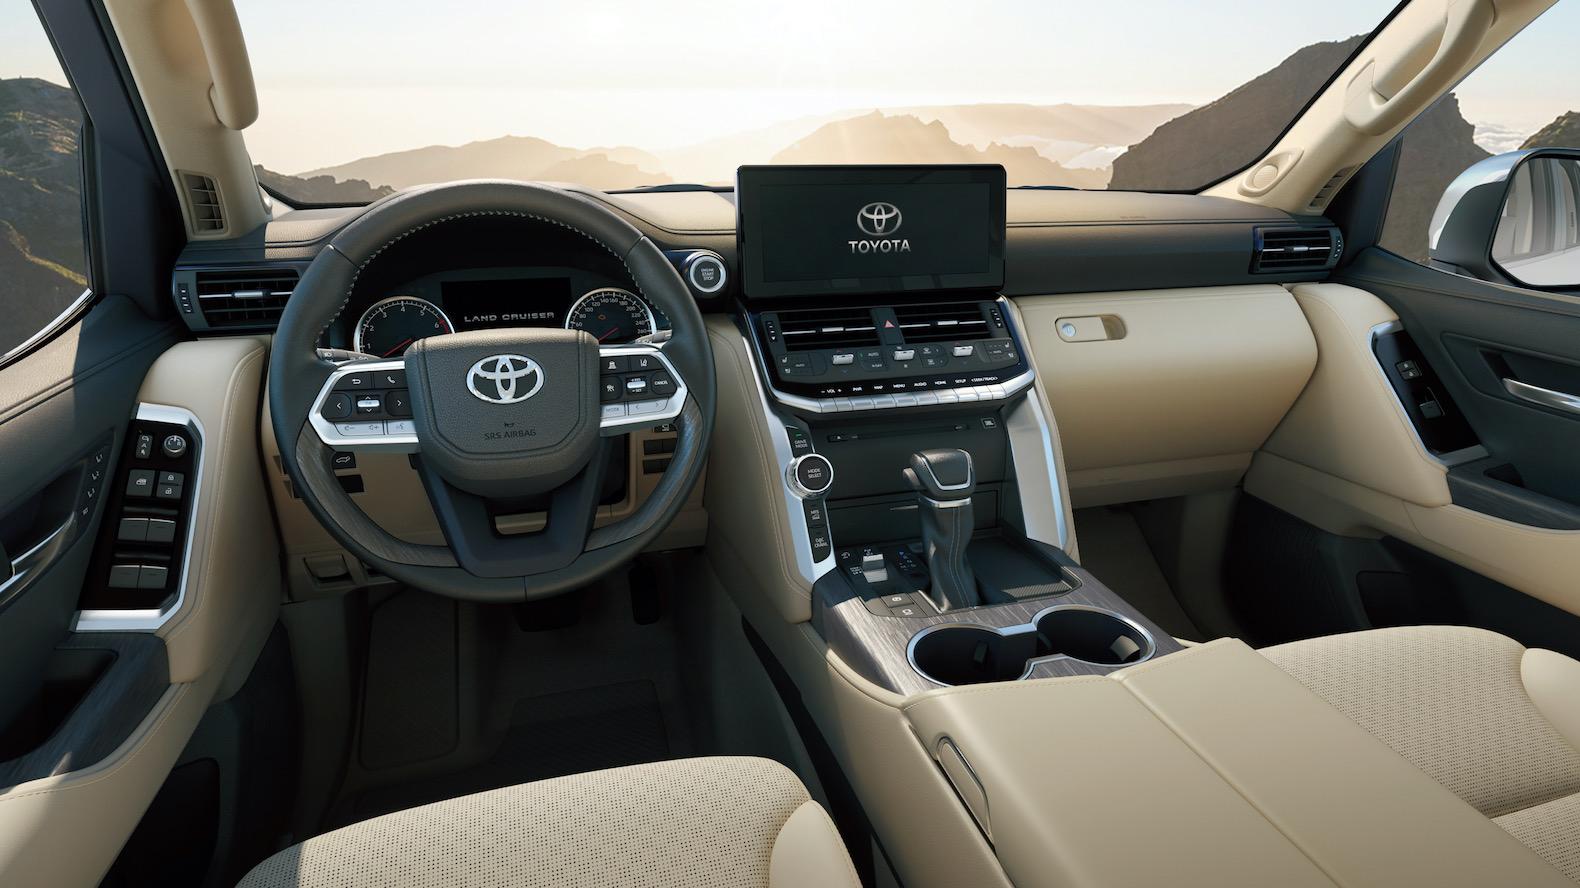 2022 Toyota Land Cruiser